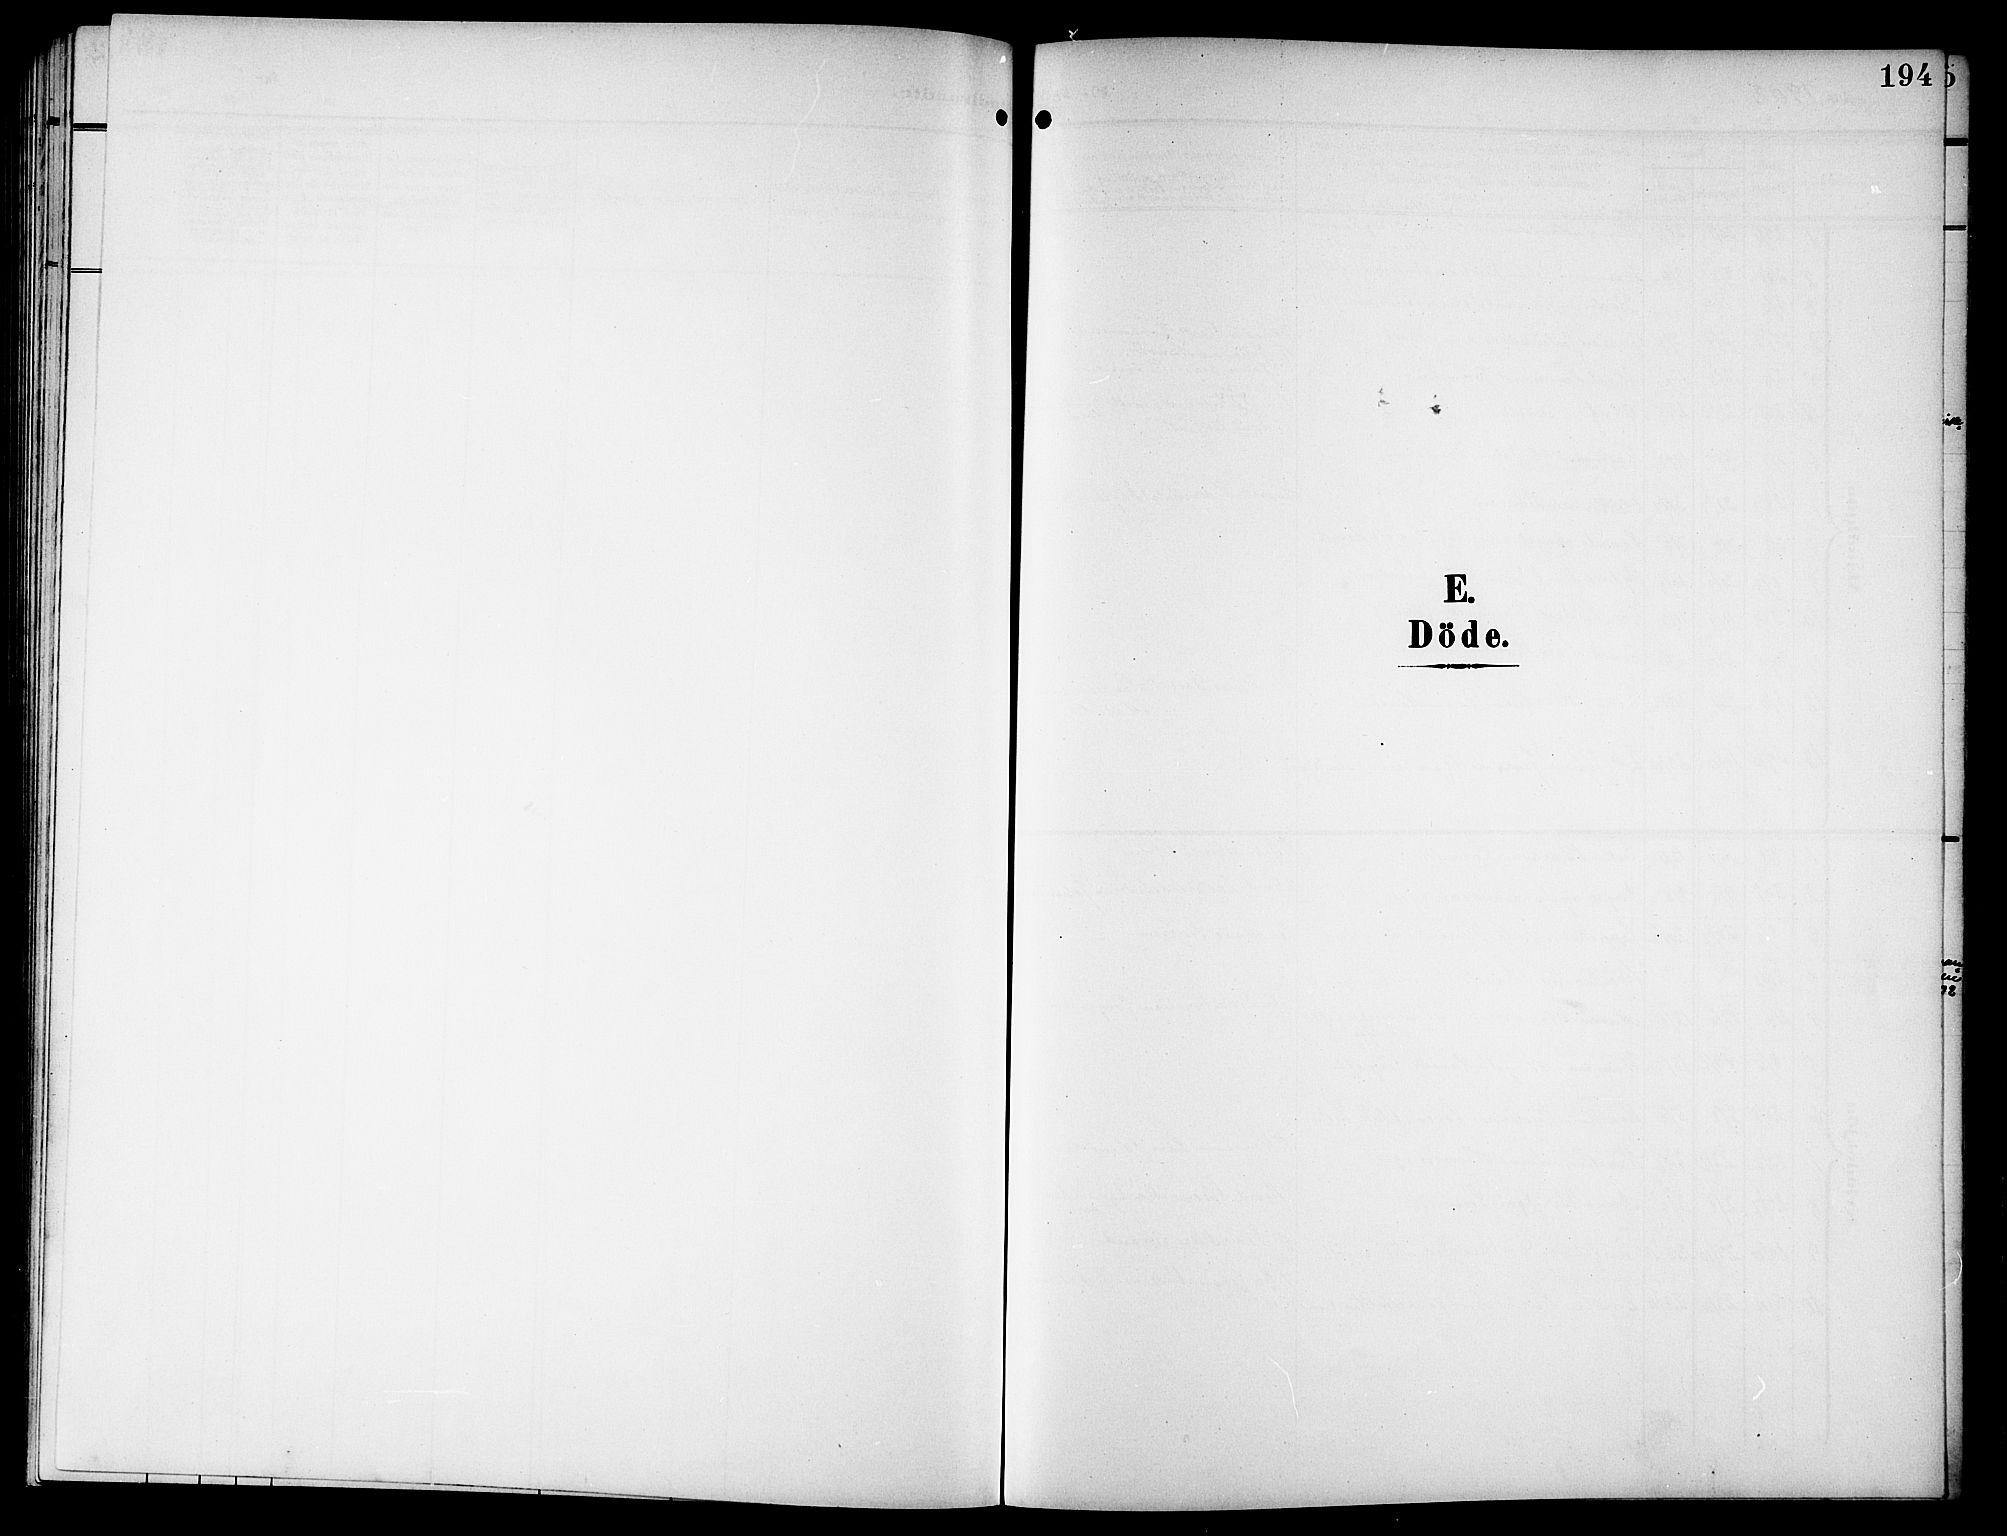 SAT, Ministerialprotokoller, klokkerbøker og fødselsregistre - Nordland, 846/L0647: Klokkerbok nr. 846C05, 1902-1916, s. 194